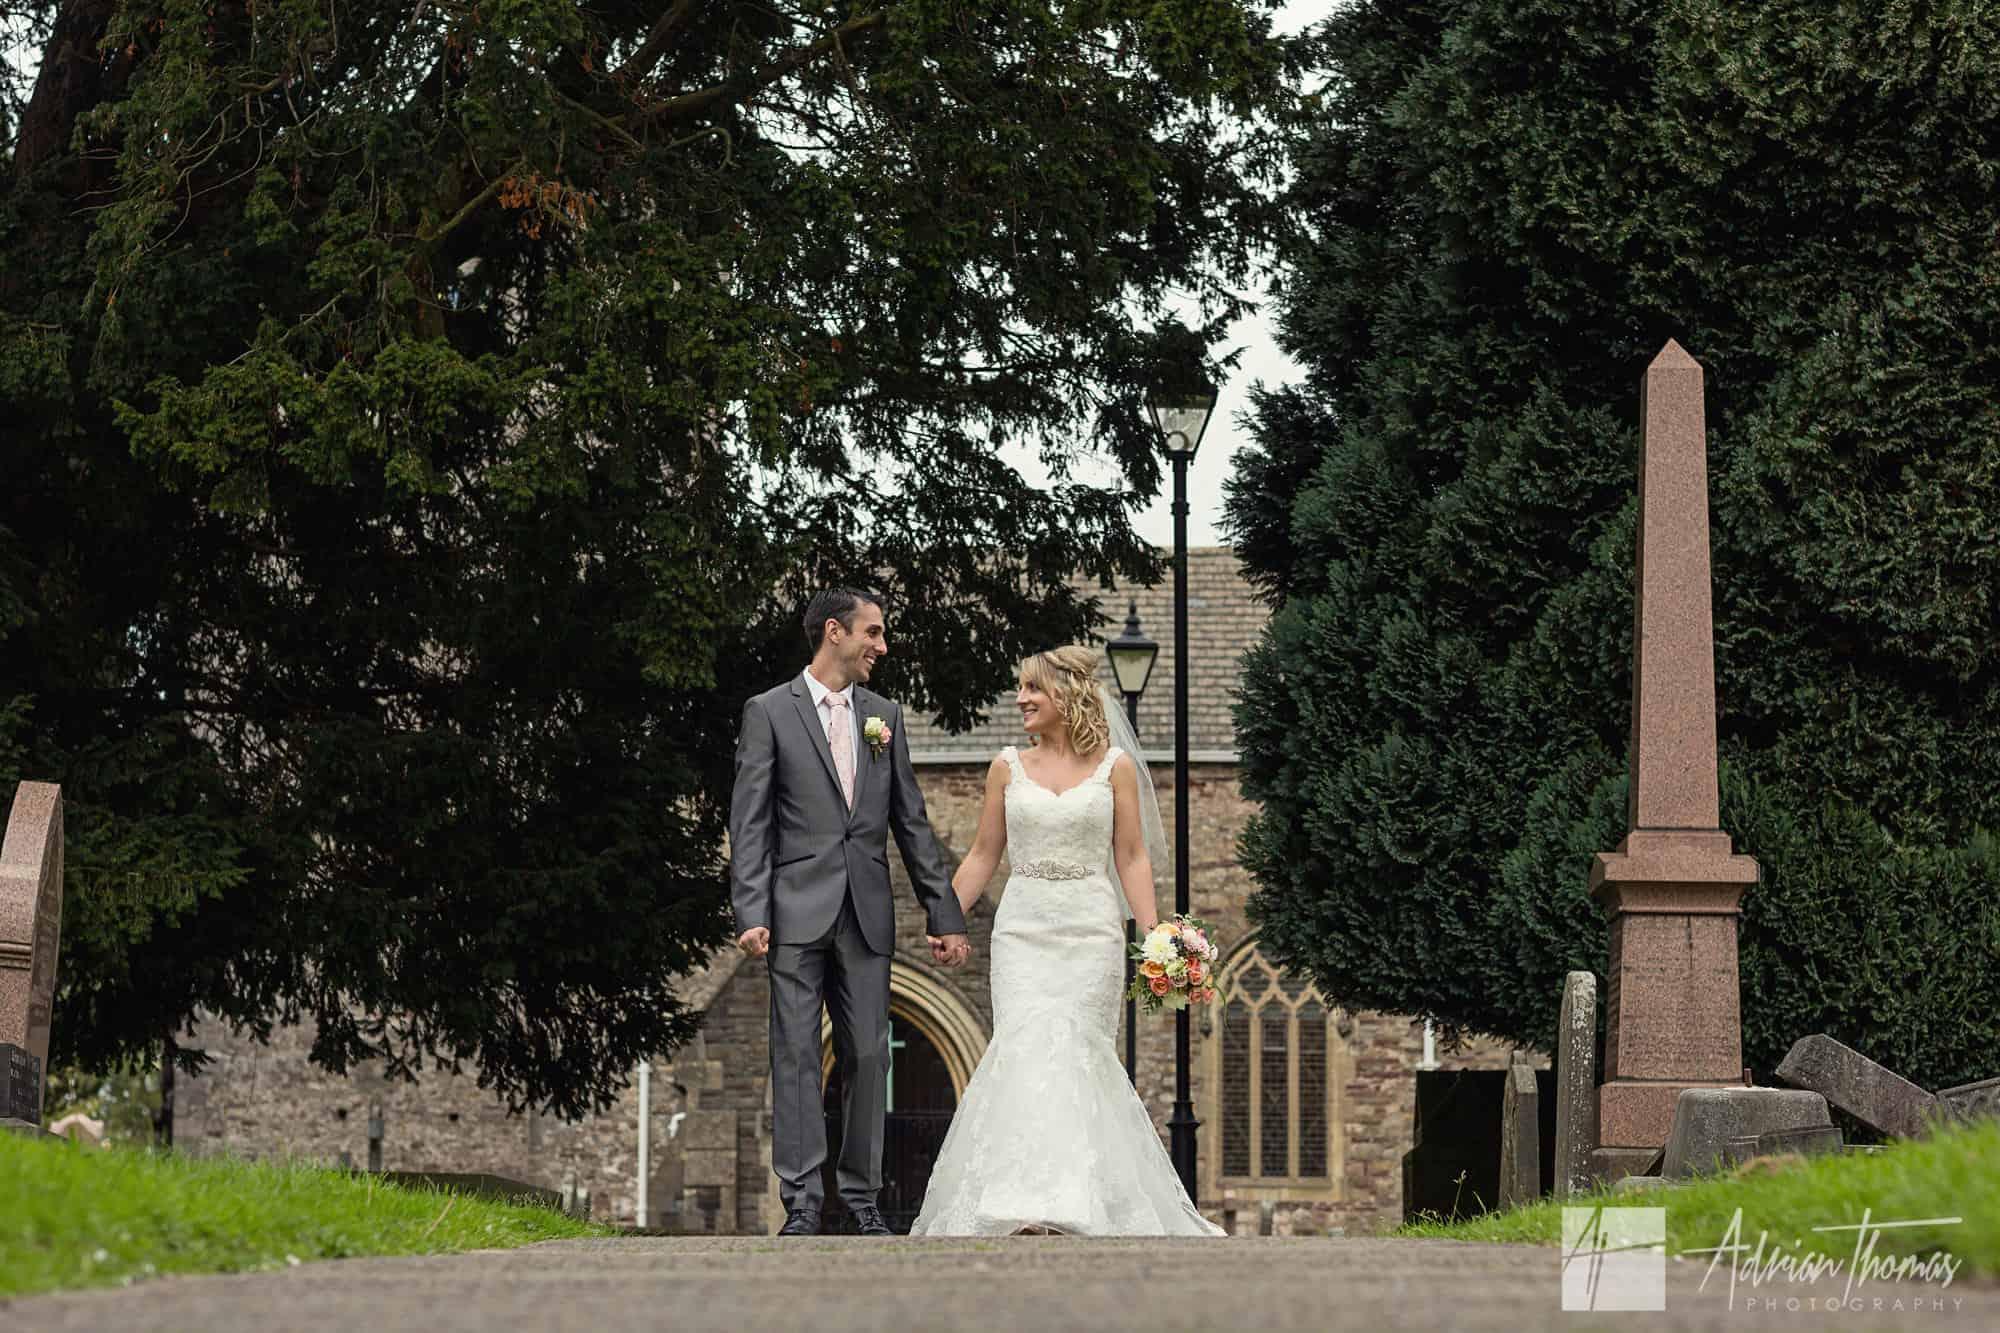 Wedding couple walking at St Basils Church in Bassaleg.